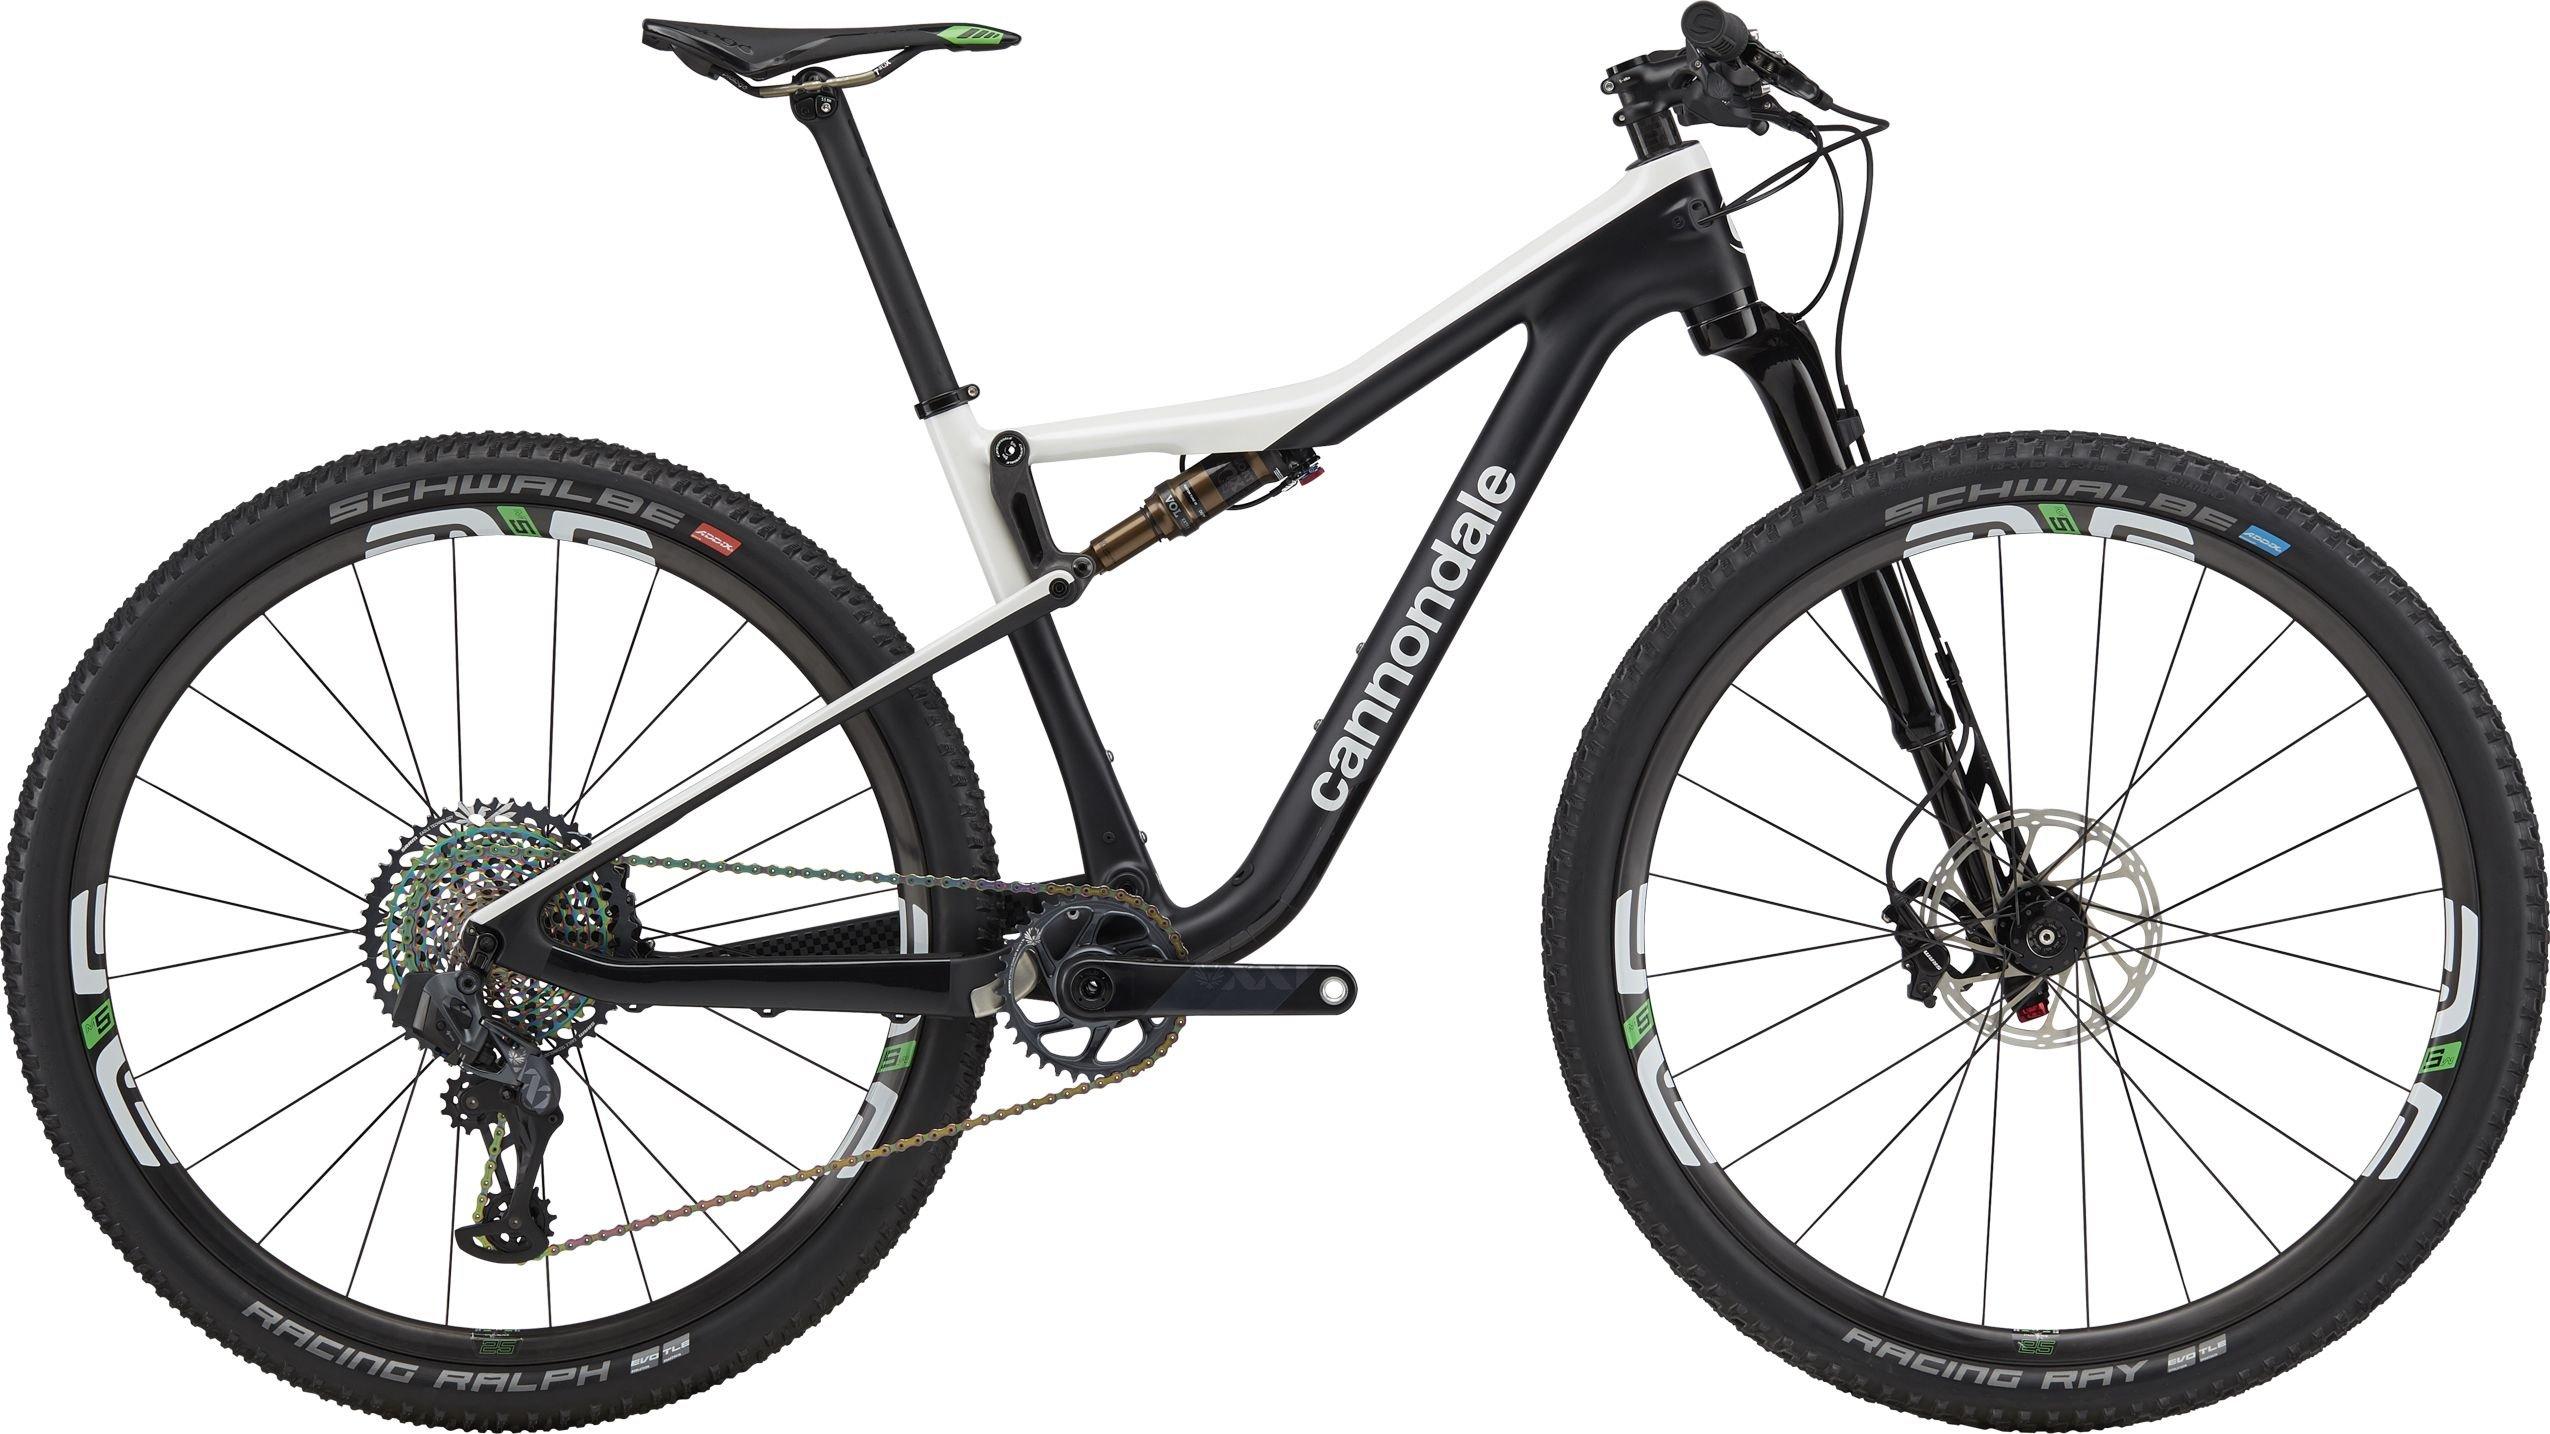 Cannondale (VTT) Scalpel Si Hi-mod World Cup Edition Mountain Bike 2020 (cyclestore.co.uk)